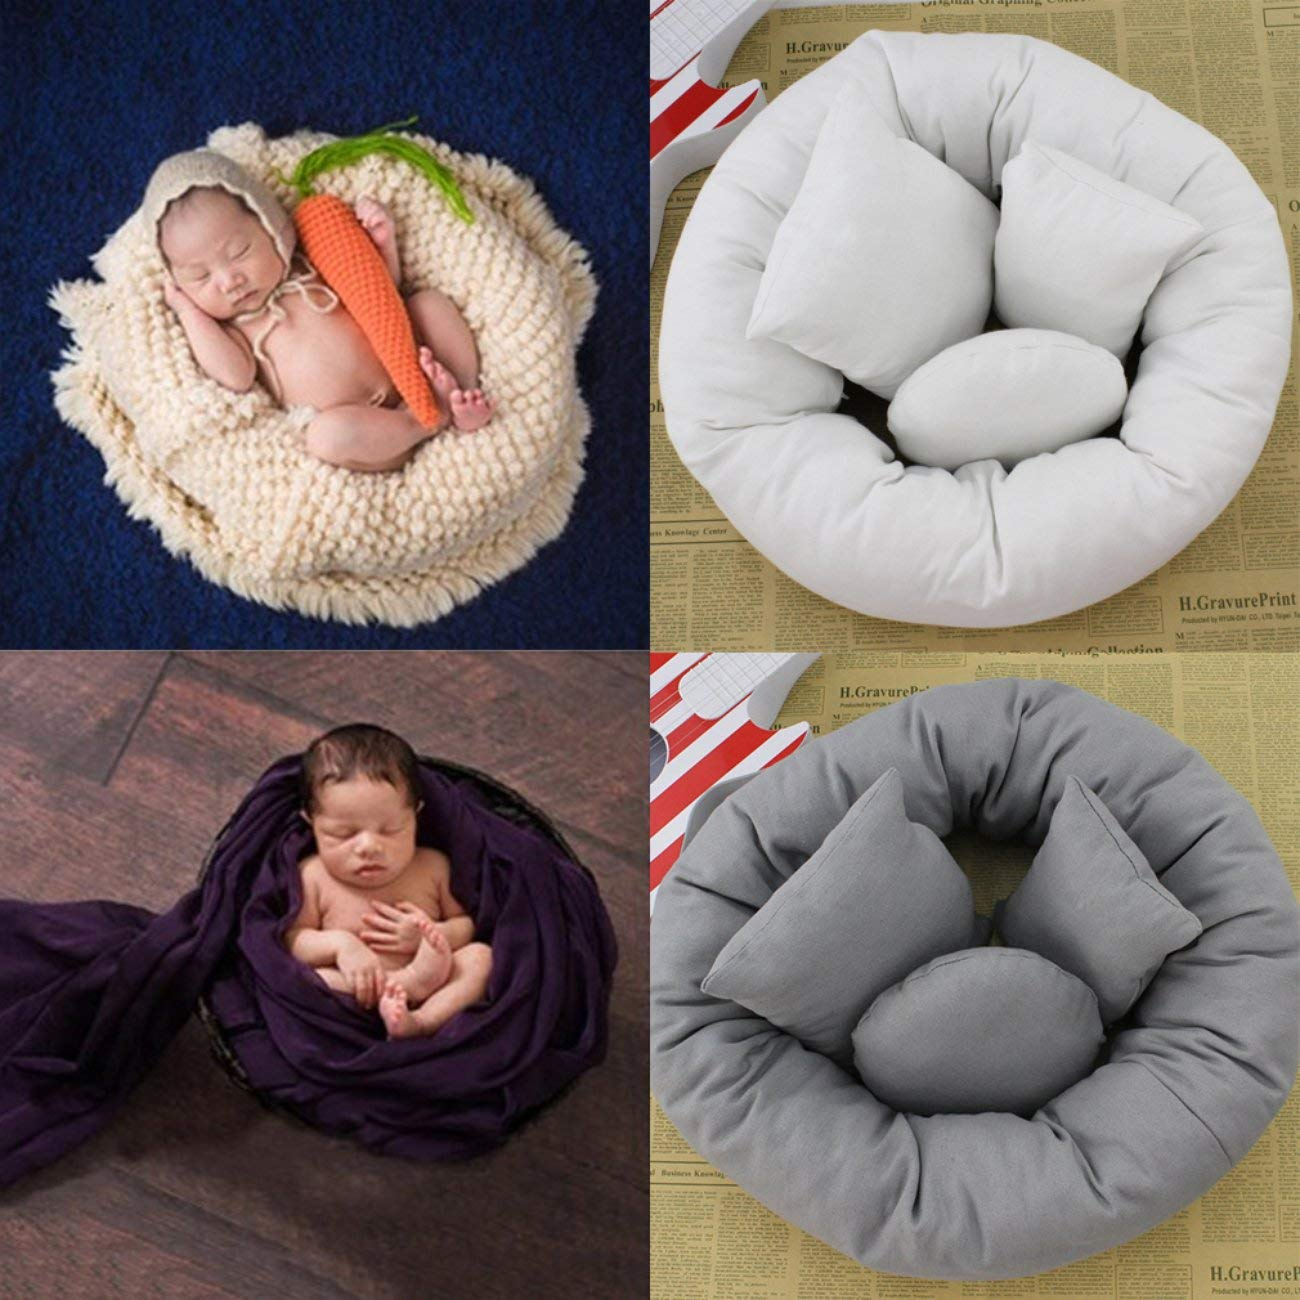 4 Teile//satz Baby Neugeborenen Kissen Korb F/üller Weizen Donut Fotografie Requisiten